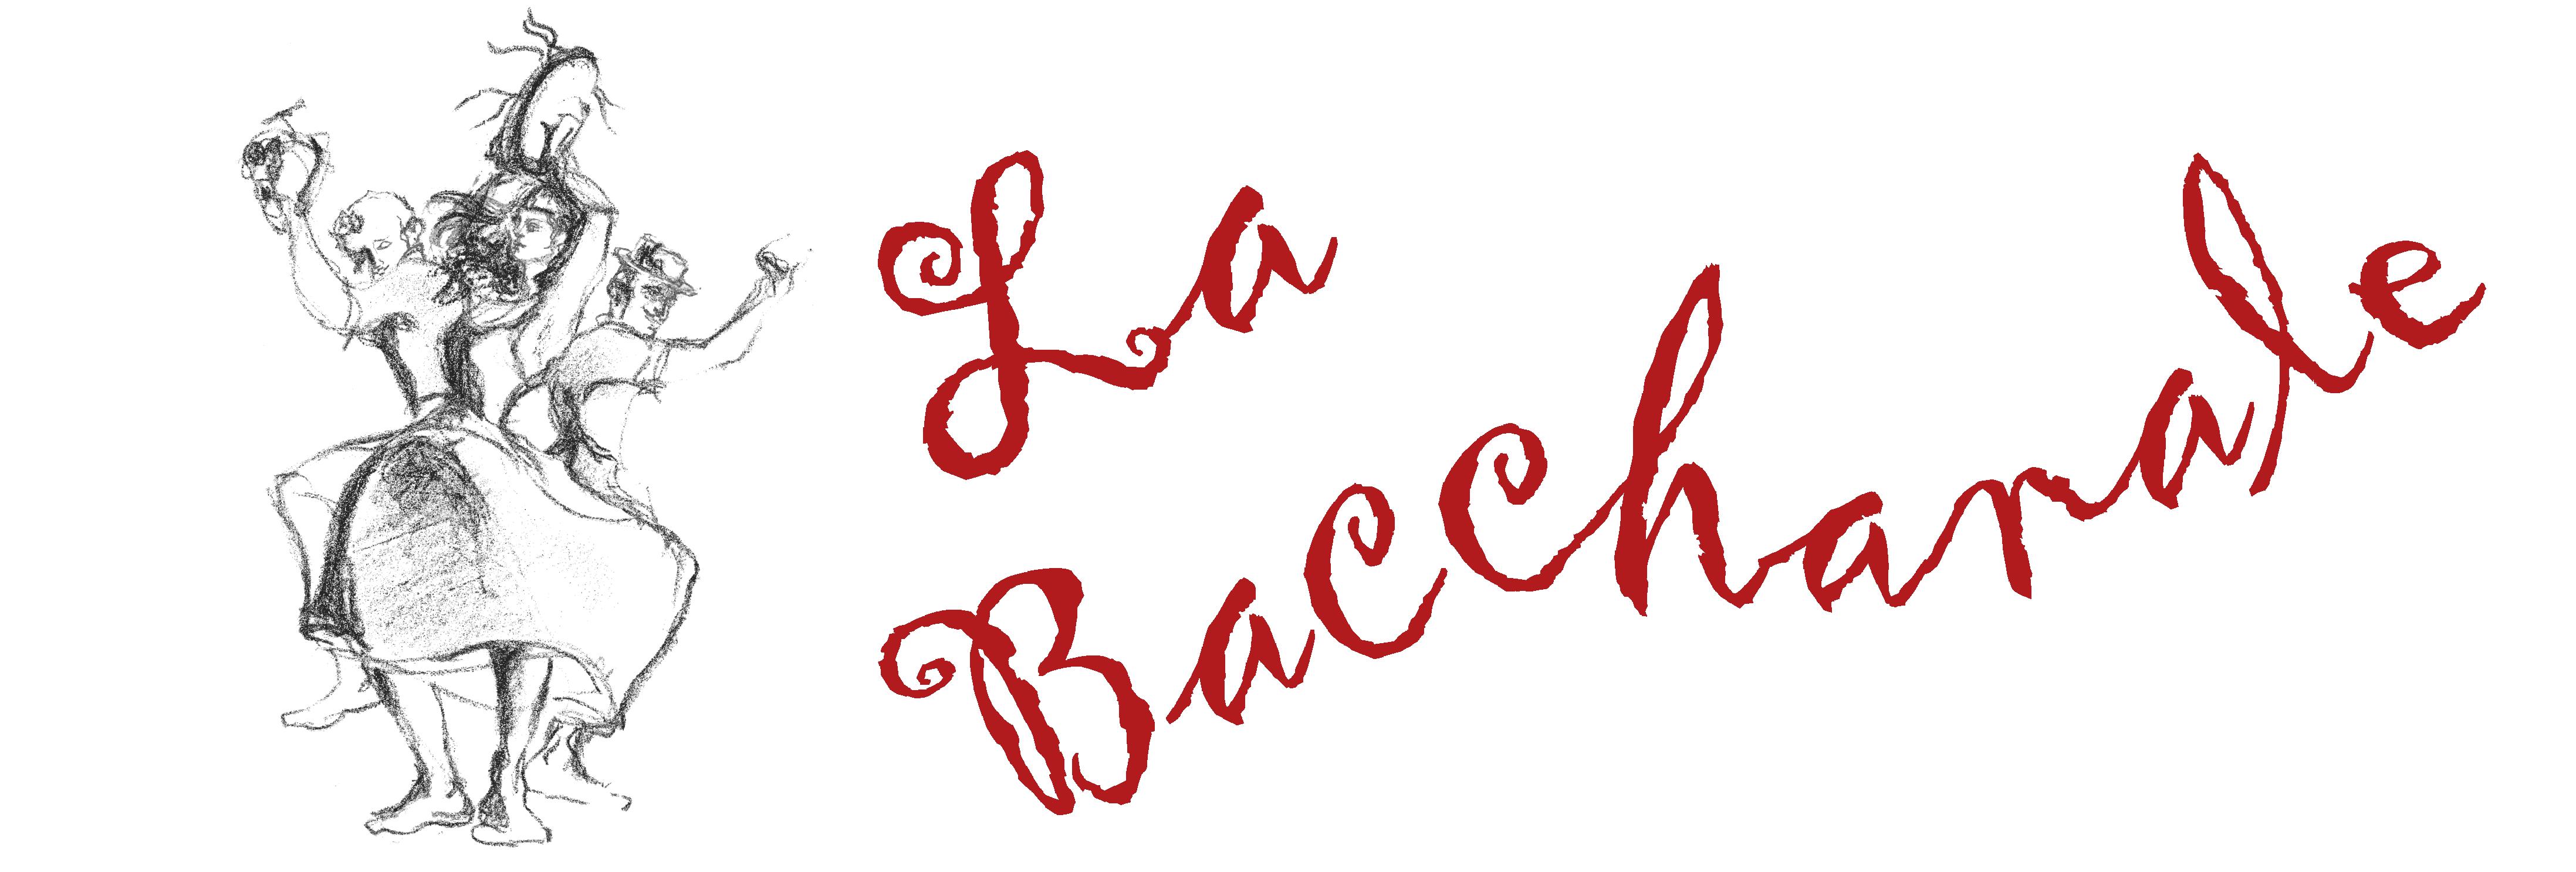 La Bacchanale